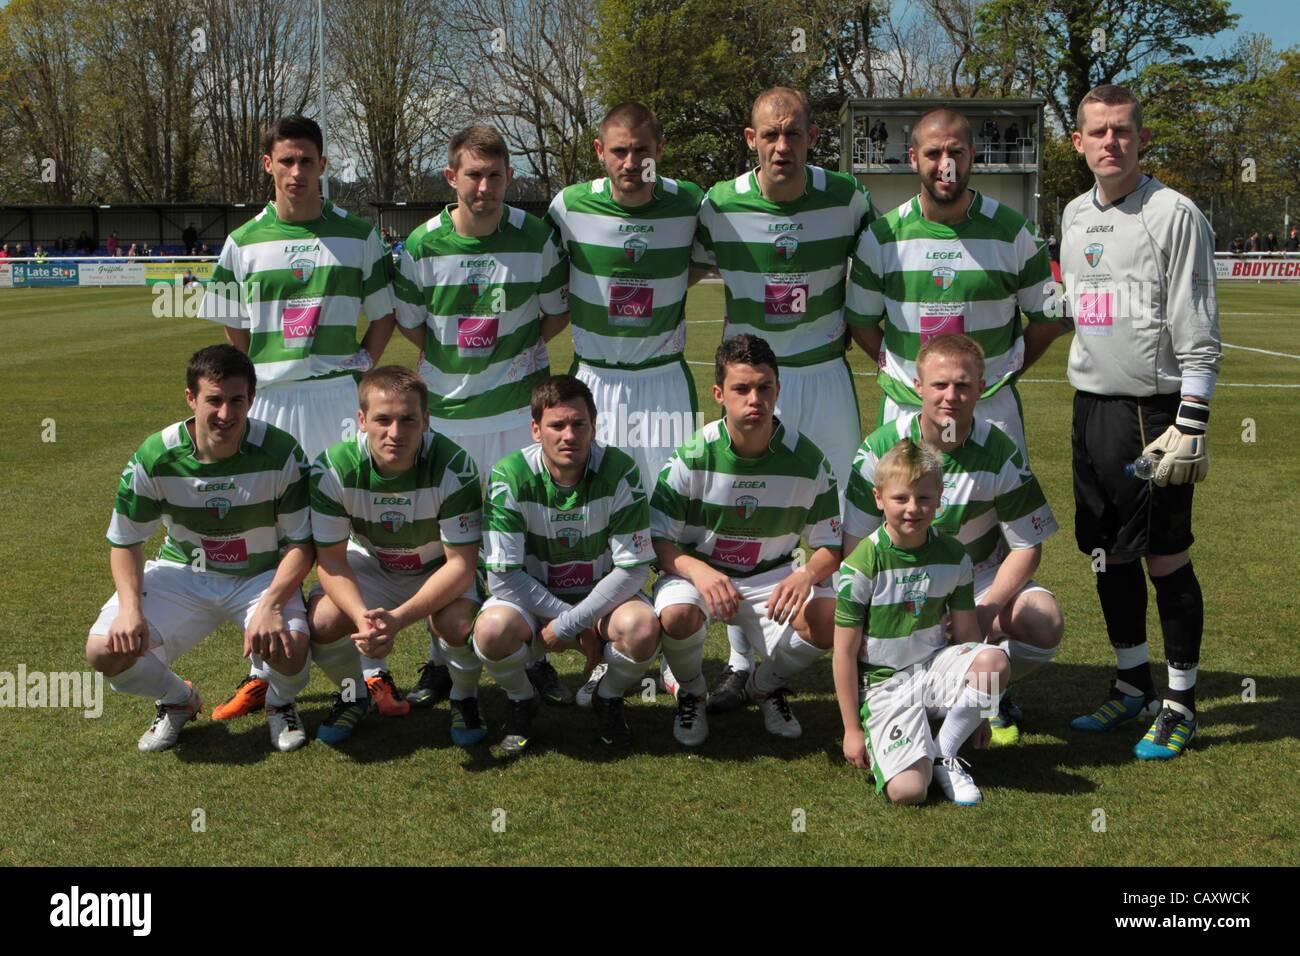 a7100f3a 05.05.2012, Bangor, Wales. Cefn Druids FC v The New Saints FC. The ...